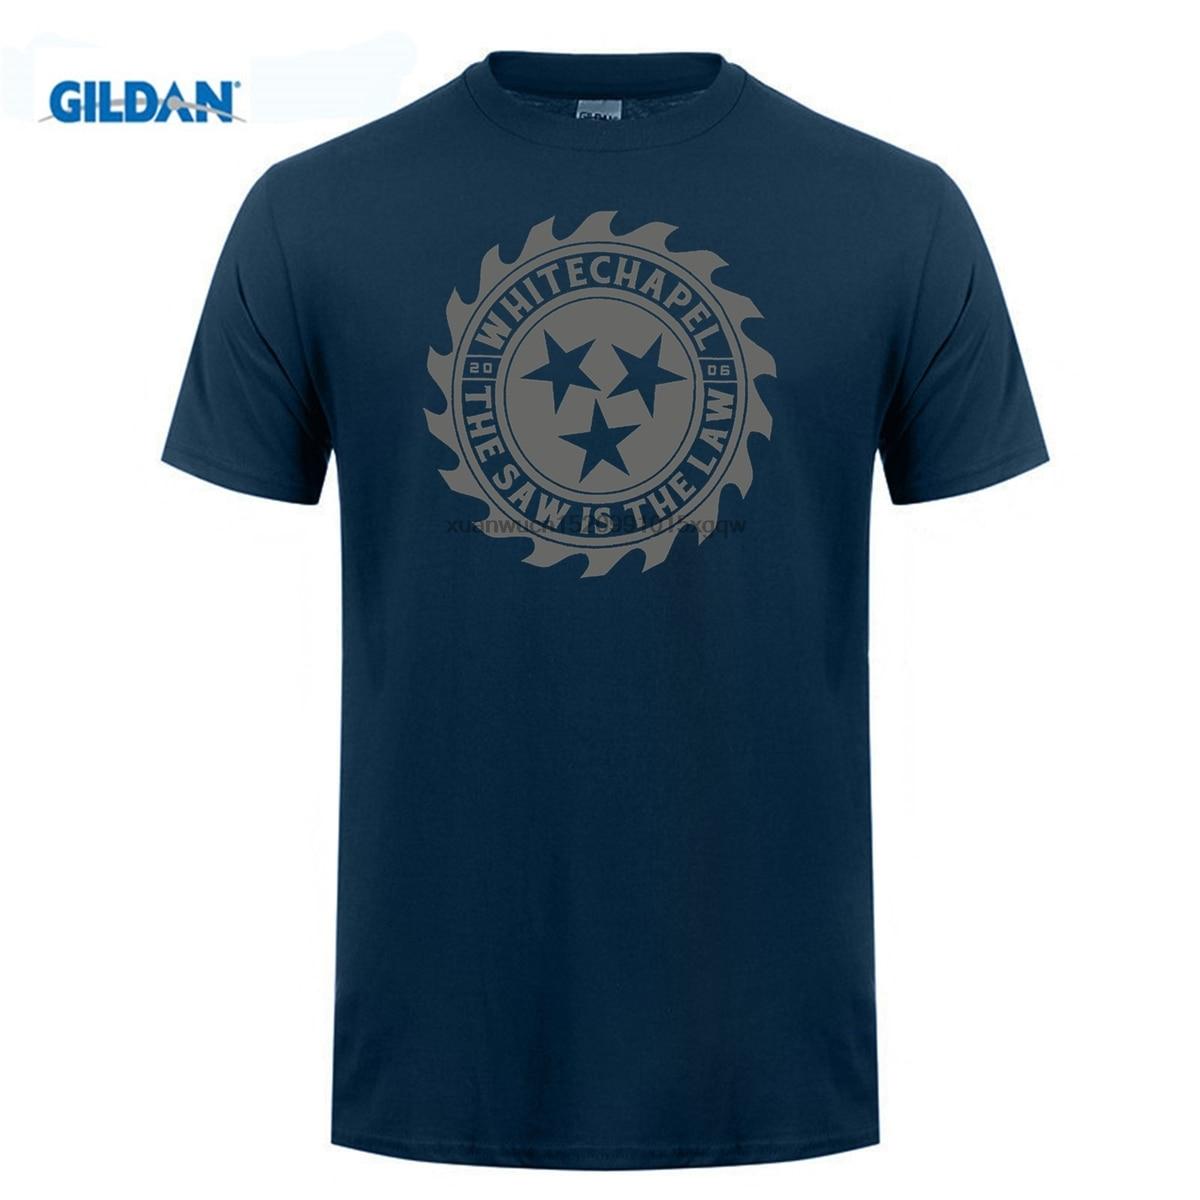 GILDAN AvatarsStore Short Sleeves Cotton Fashion T Shirt Free Shipping Whitechapel Men 39 s Saw Is The Law T shirt Black in T Shirts from Men 39 s Clothing